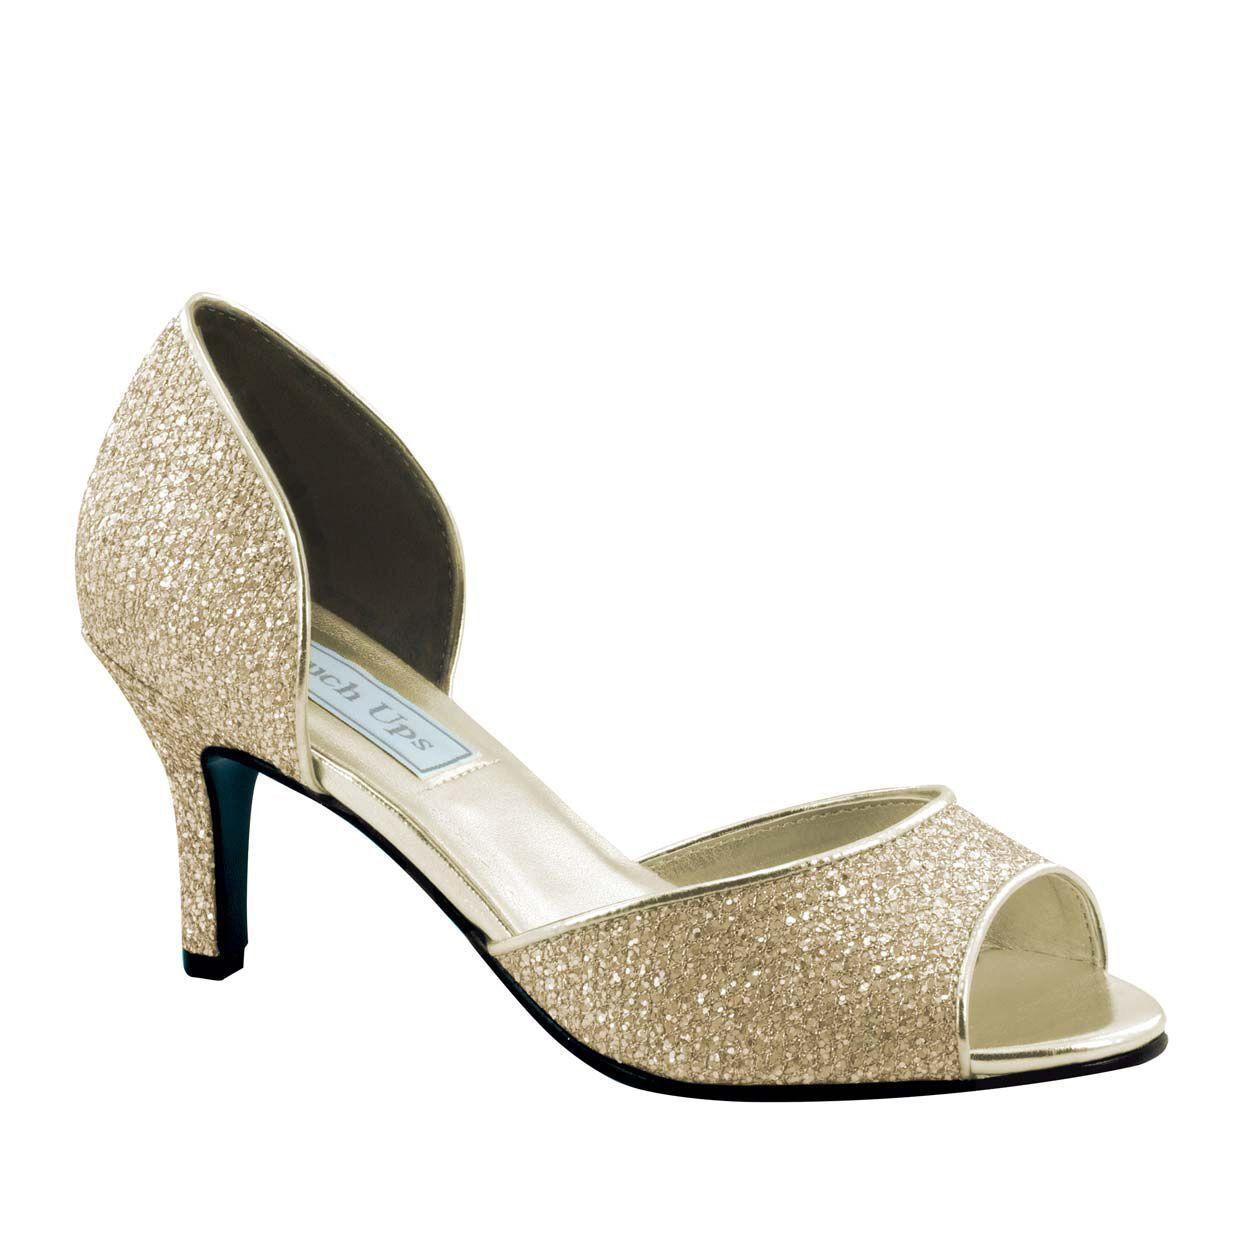 Damens's Touch Ups Jolee Mid 8.5 Heel Pump Champaign Größe 8.5 Mid #NCM28-M52 dd3b3e